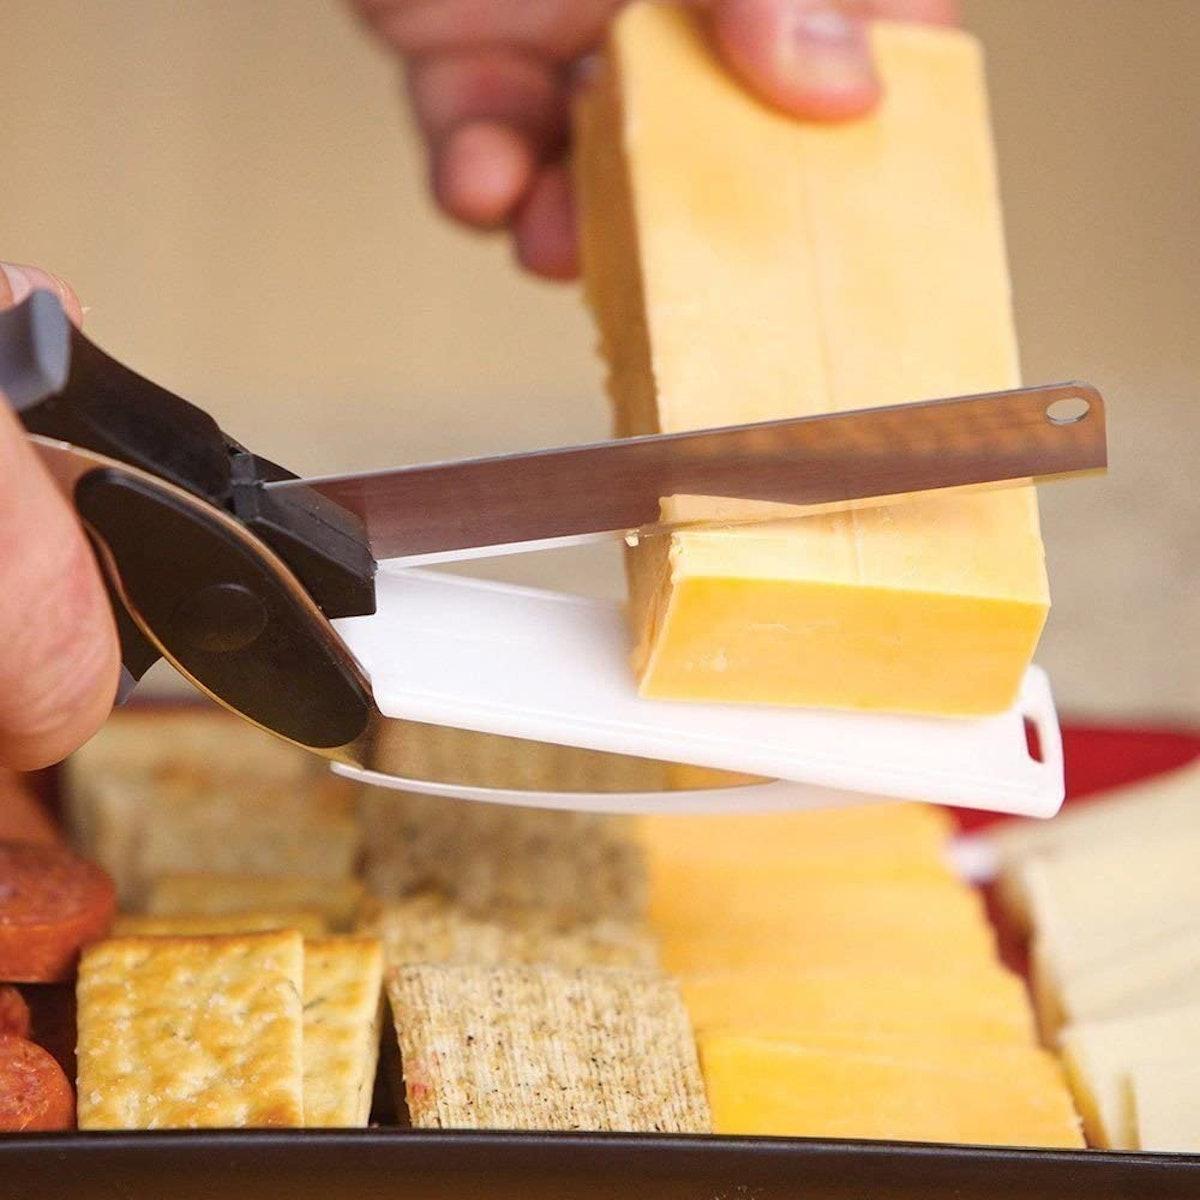 ASHUI 2-in-1 Knife & Cutting Board